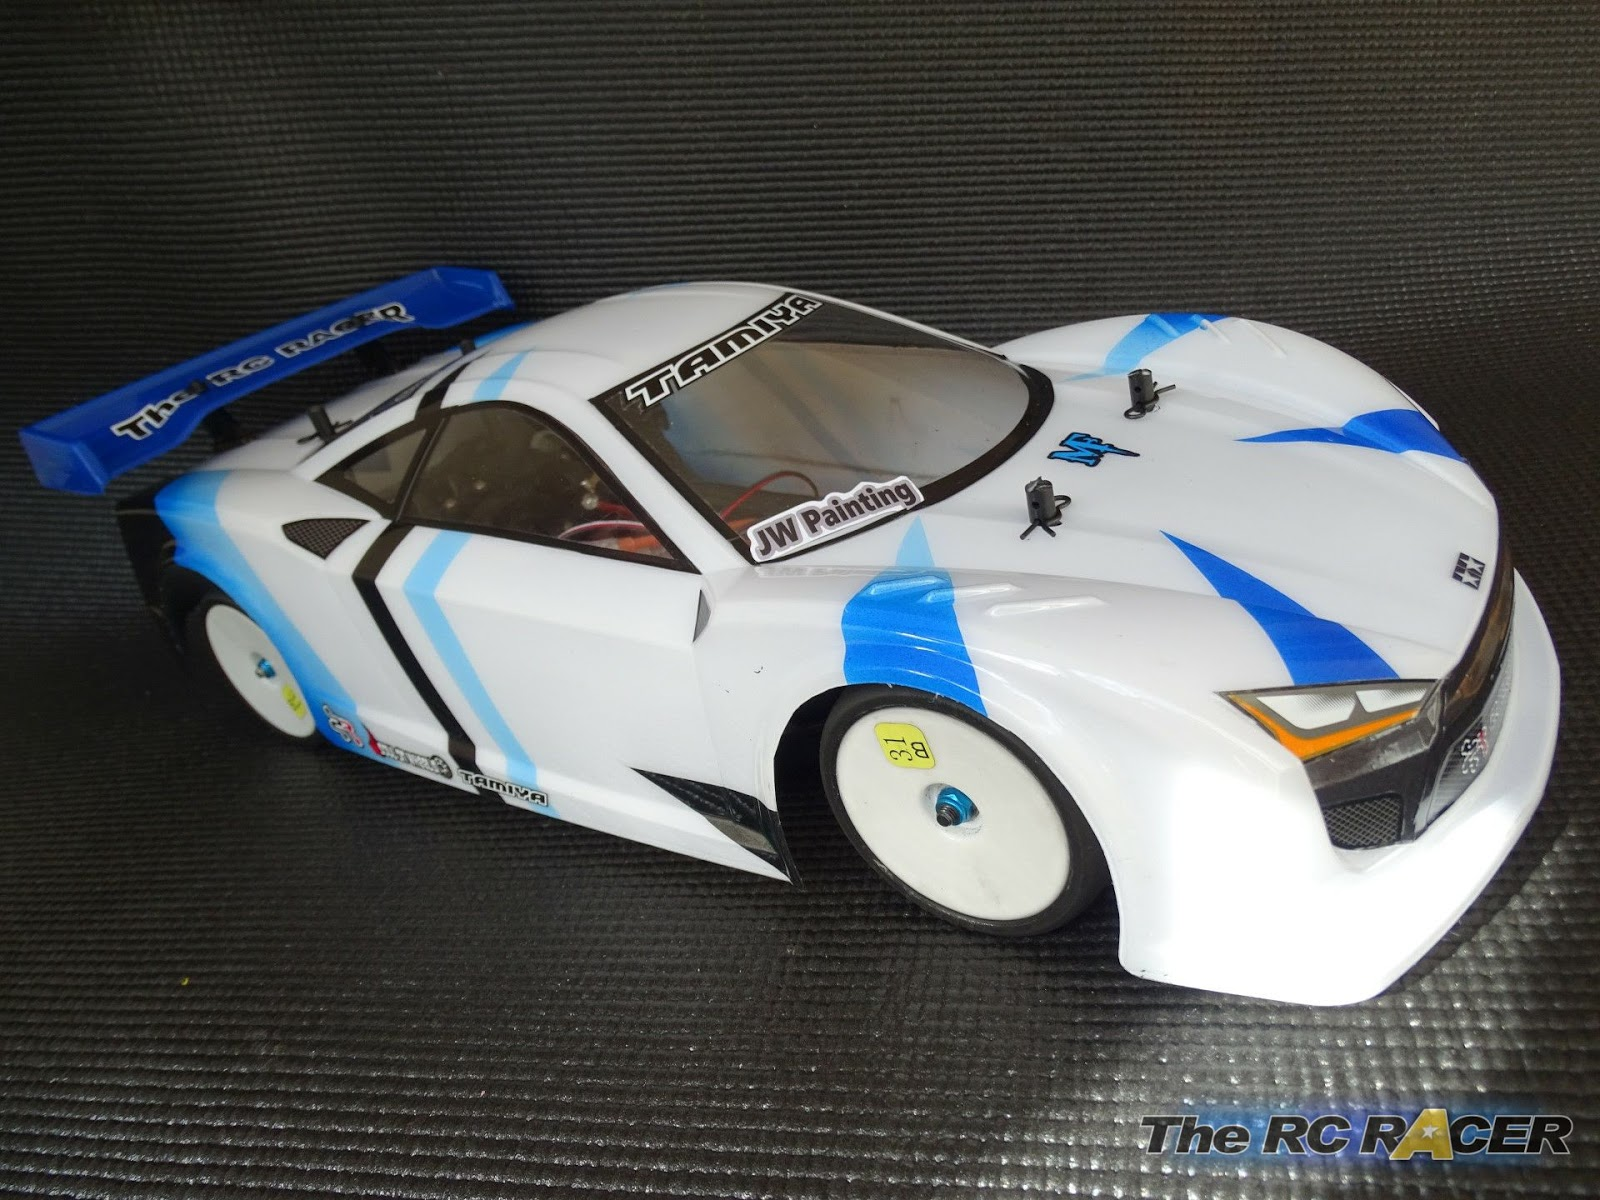 DSC03050%2B%2528Custom%2529 Fascinating Hpi Racing 7038 Porsche 911 Gt1 Cars Trend